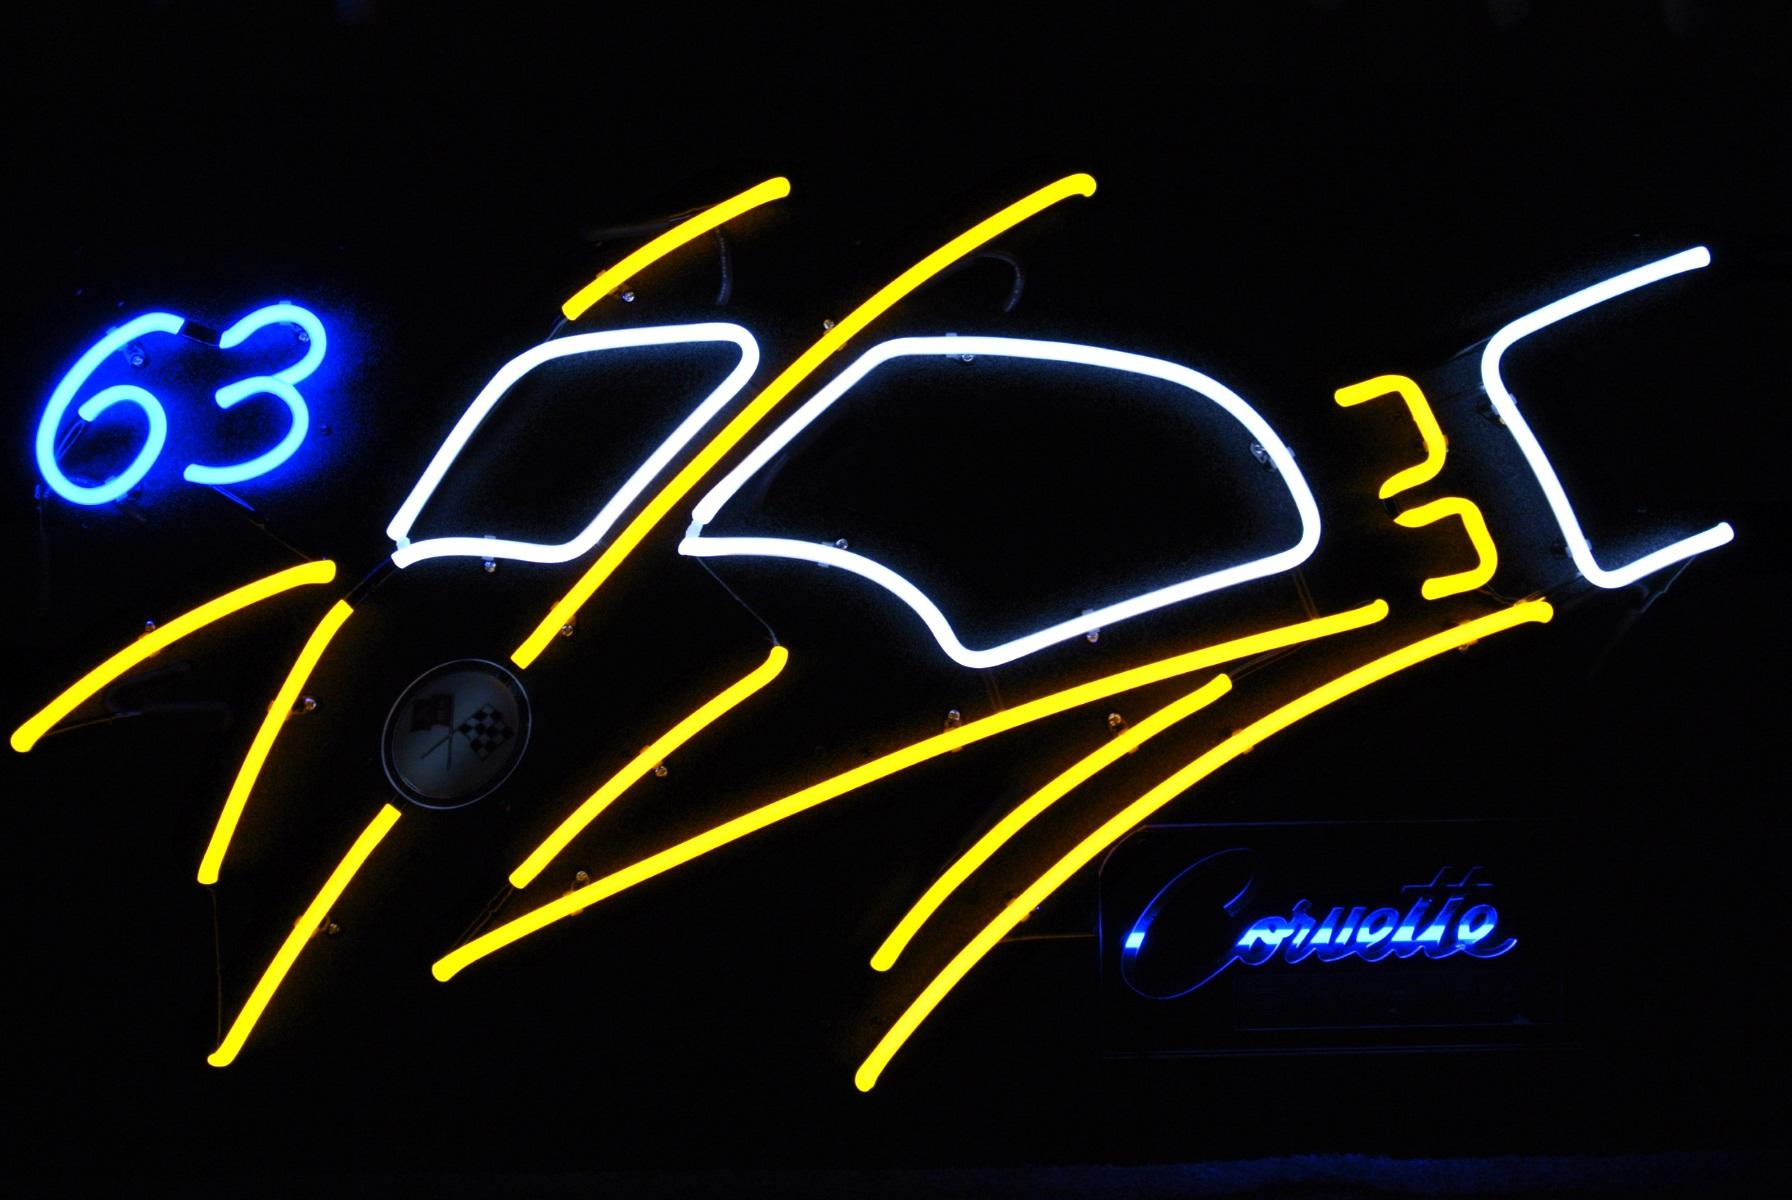 Custom Neon Automotive Sculptures by John Barton - BartonNeonMagic.com